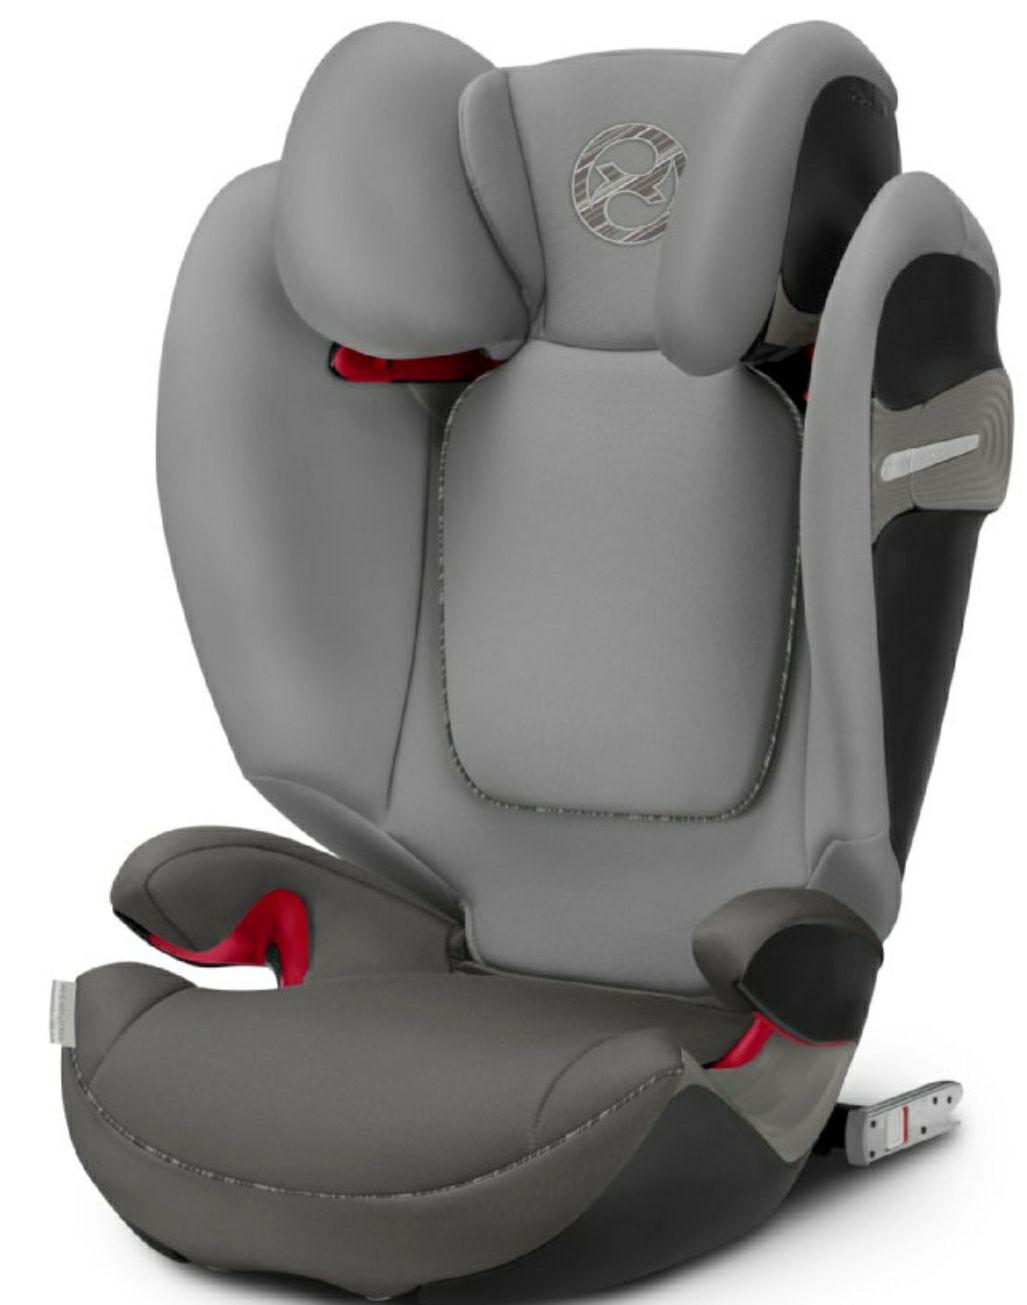 Kindersitz Cybex Solution S-Fix Manhattan Grey